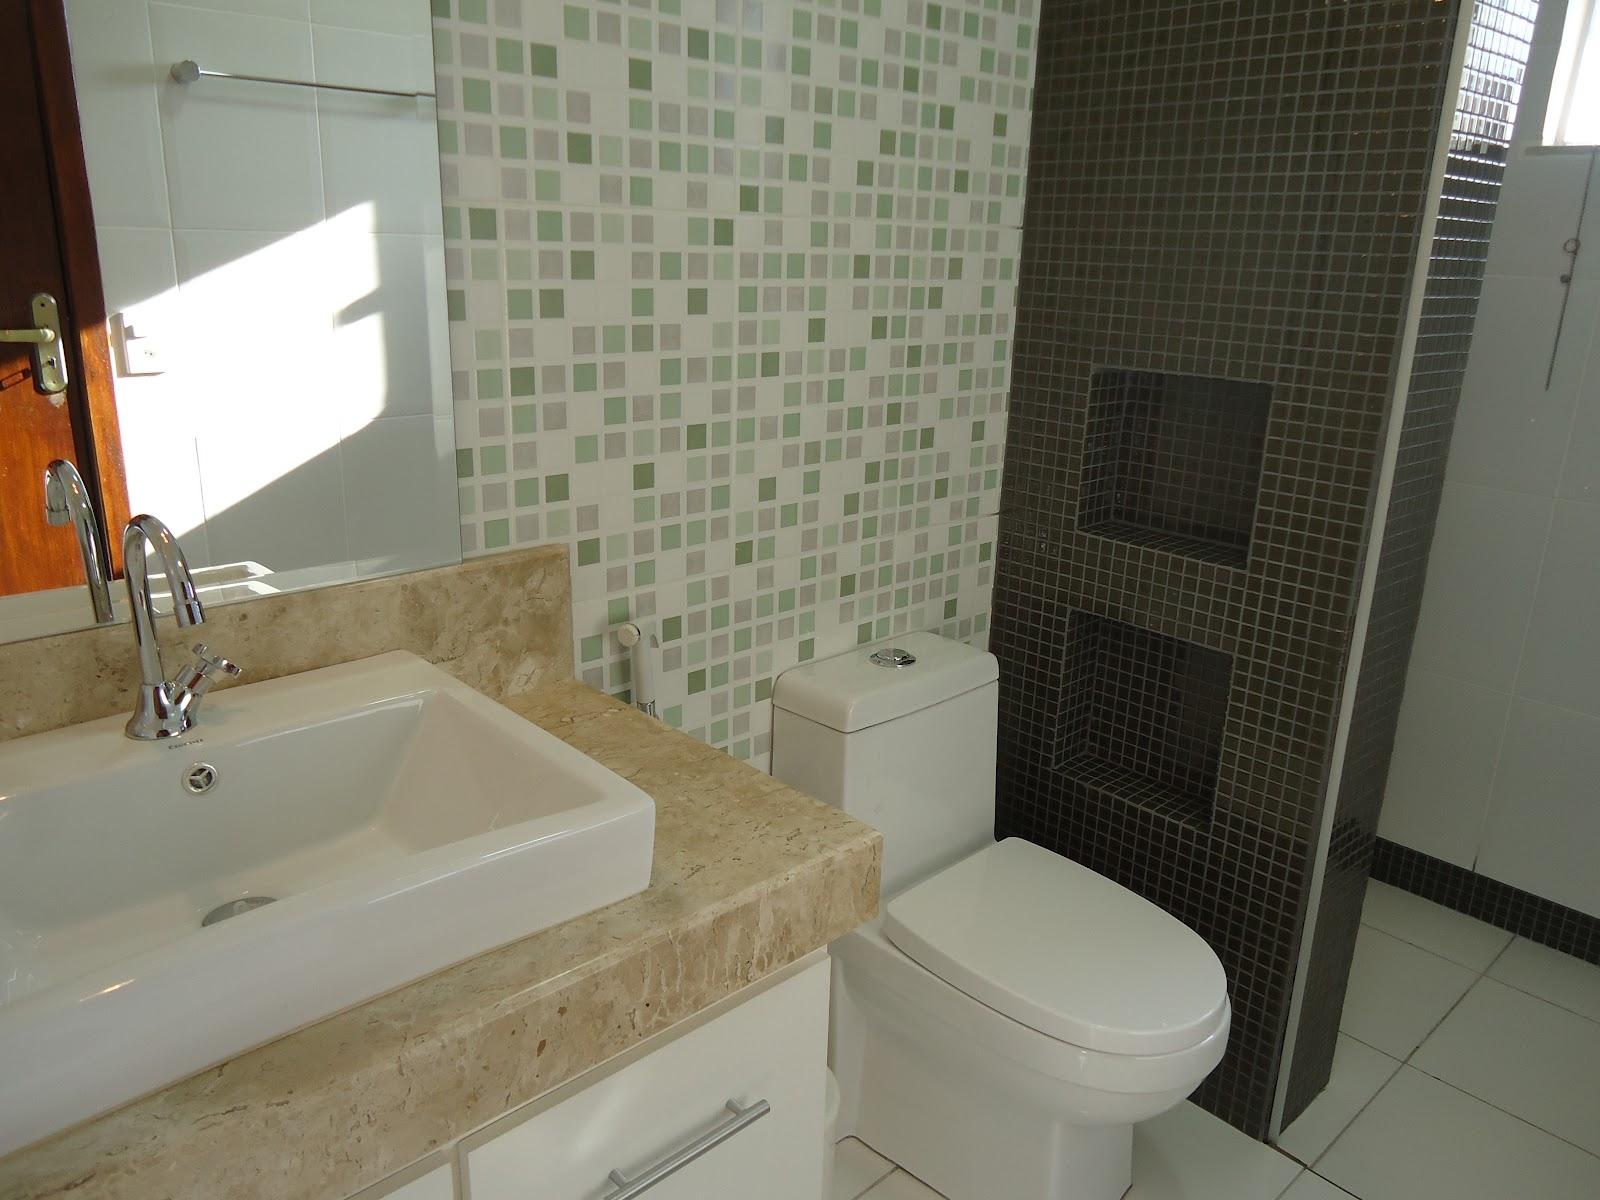 Arquiteta Bianca Monteiro Pastilhas e vidro nos banheiros -> Banheiros Com Pastilhas Escuras